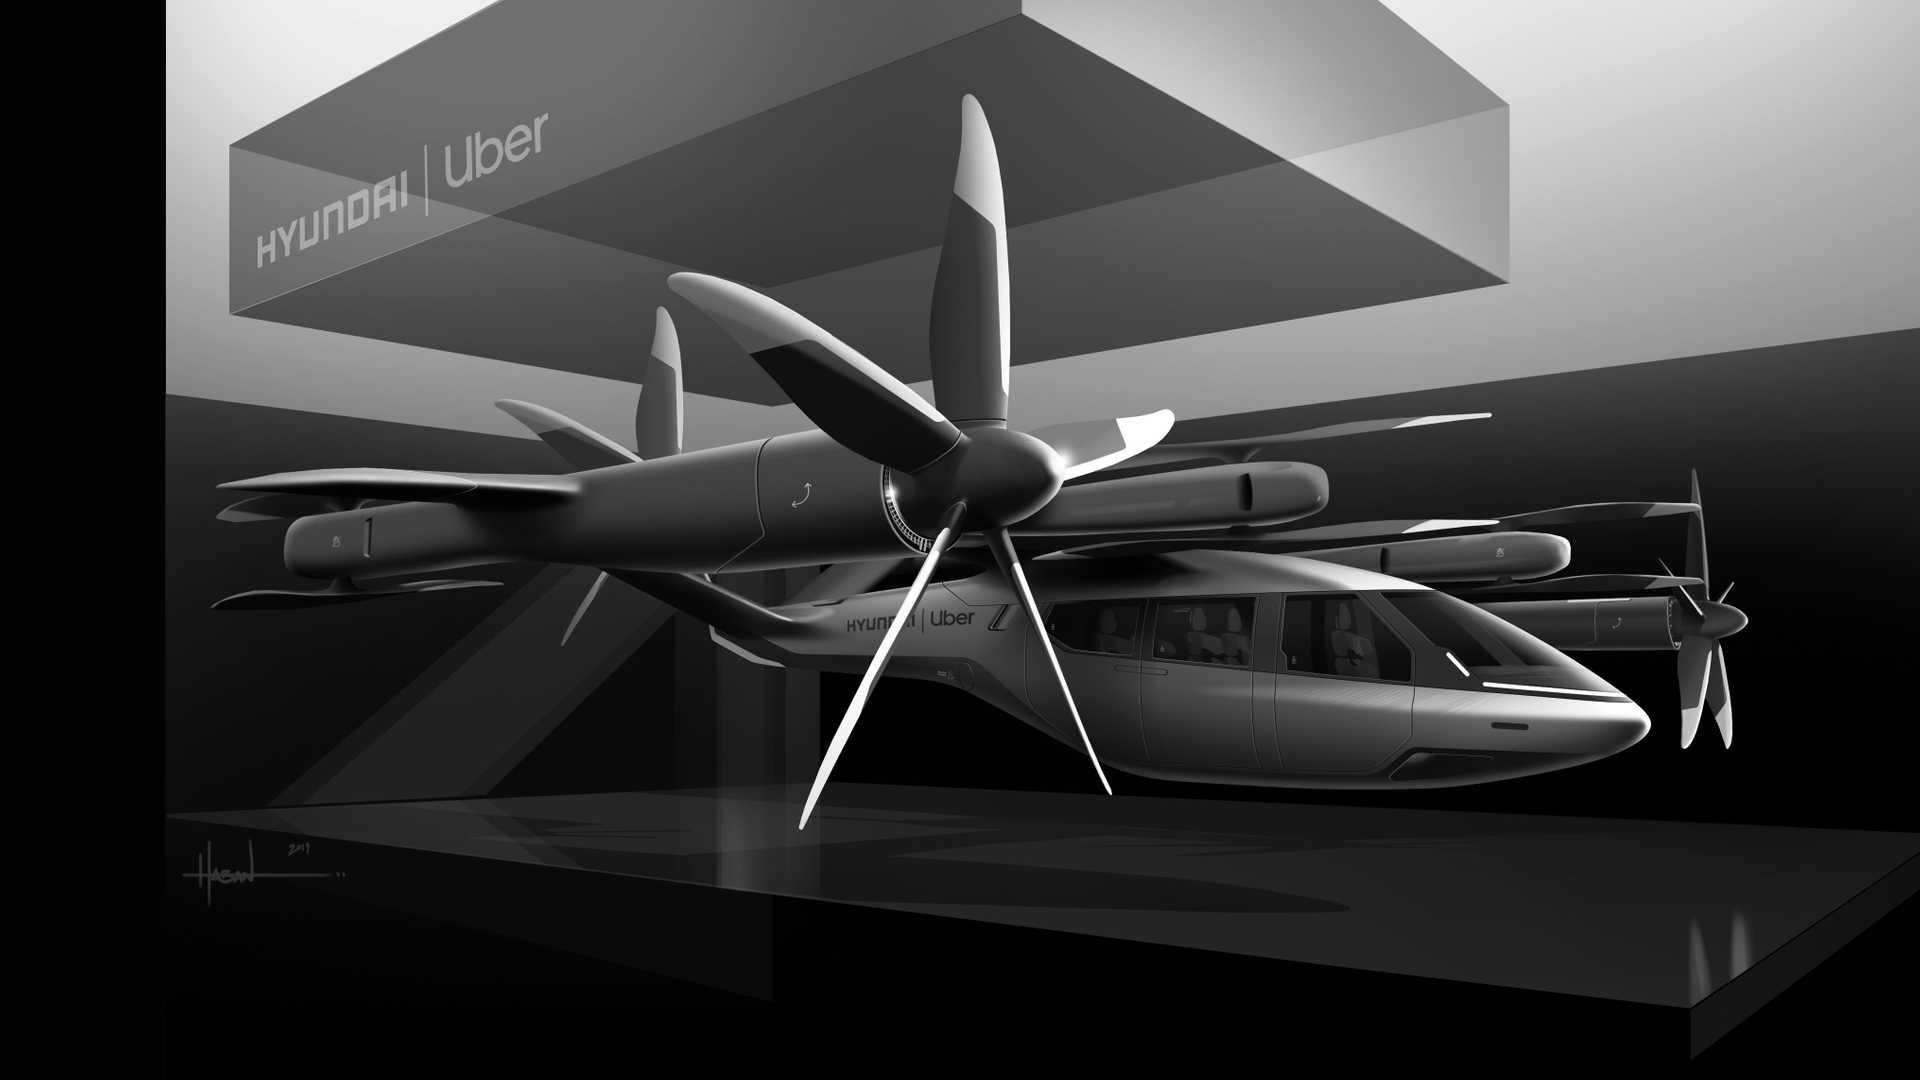 hyundai-uber-ridshare-air-taxi-concept-6